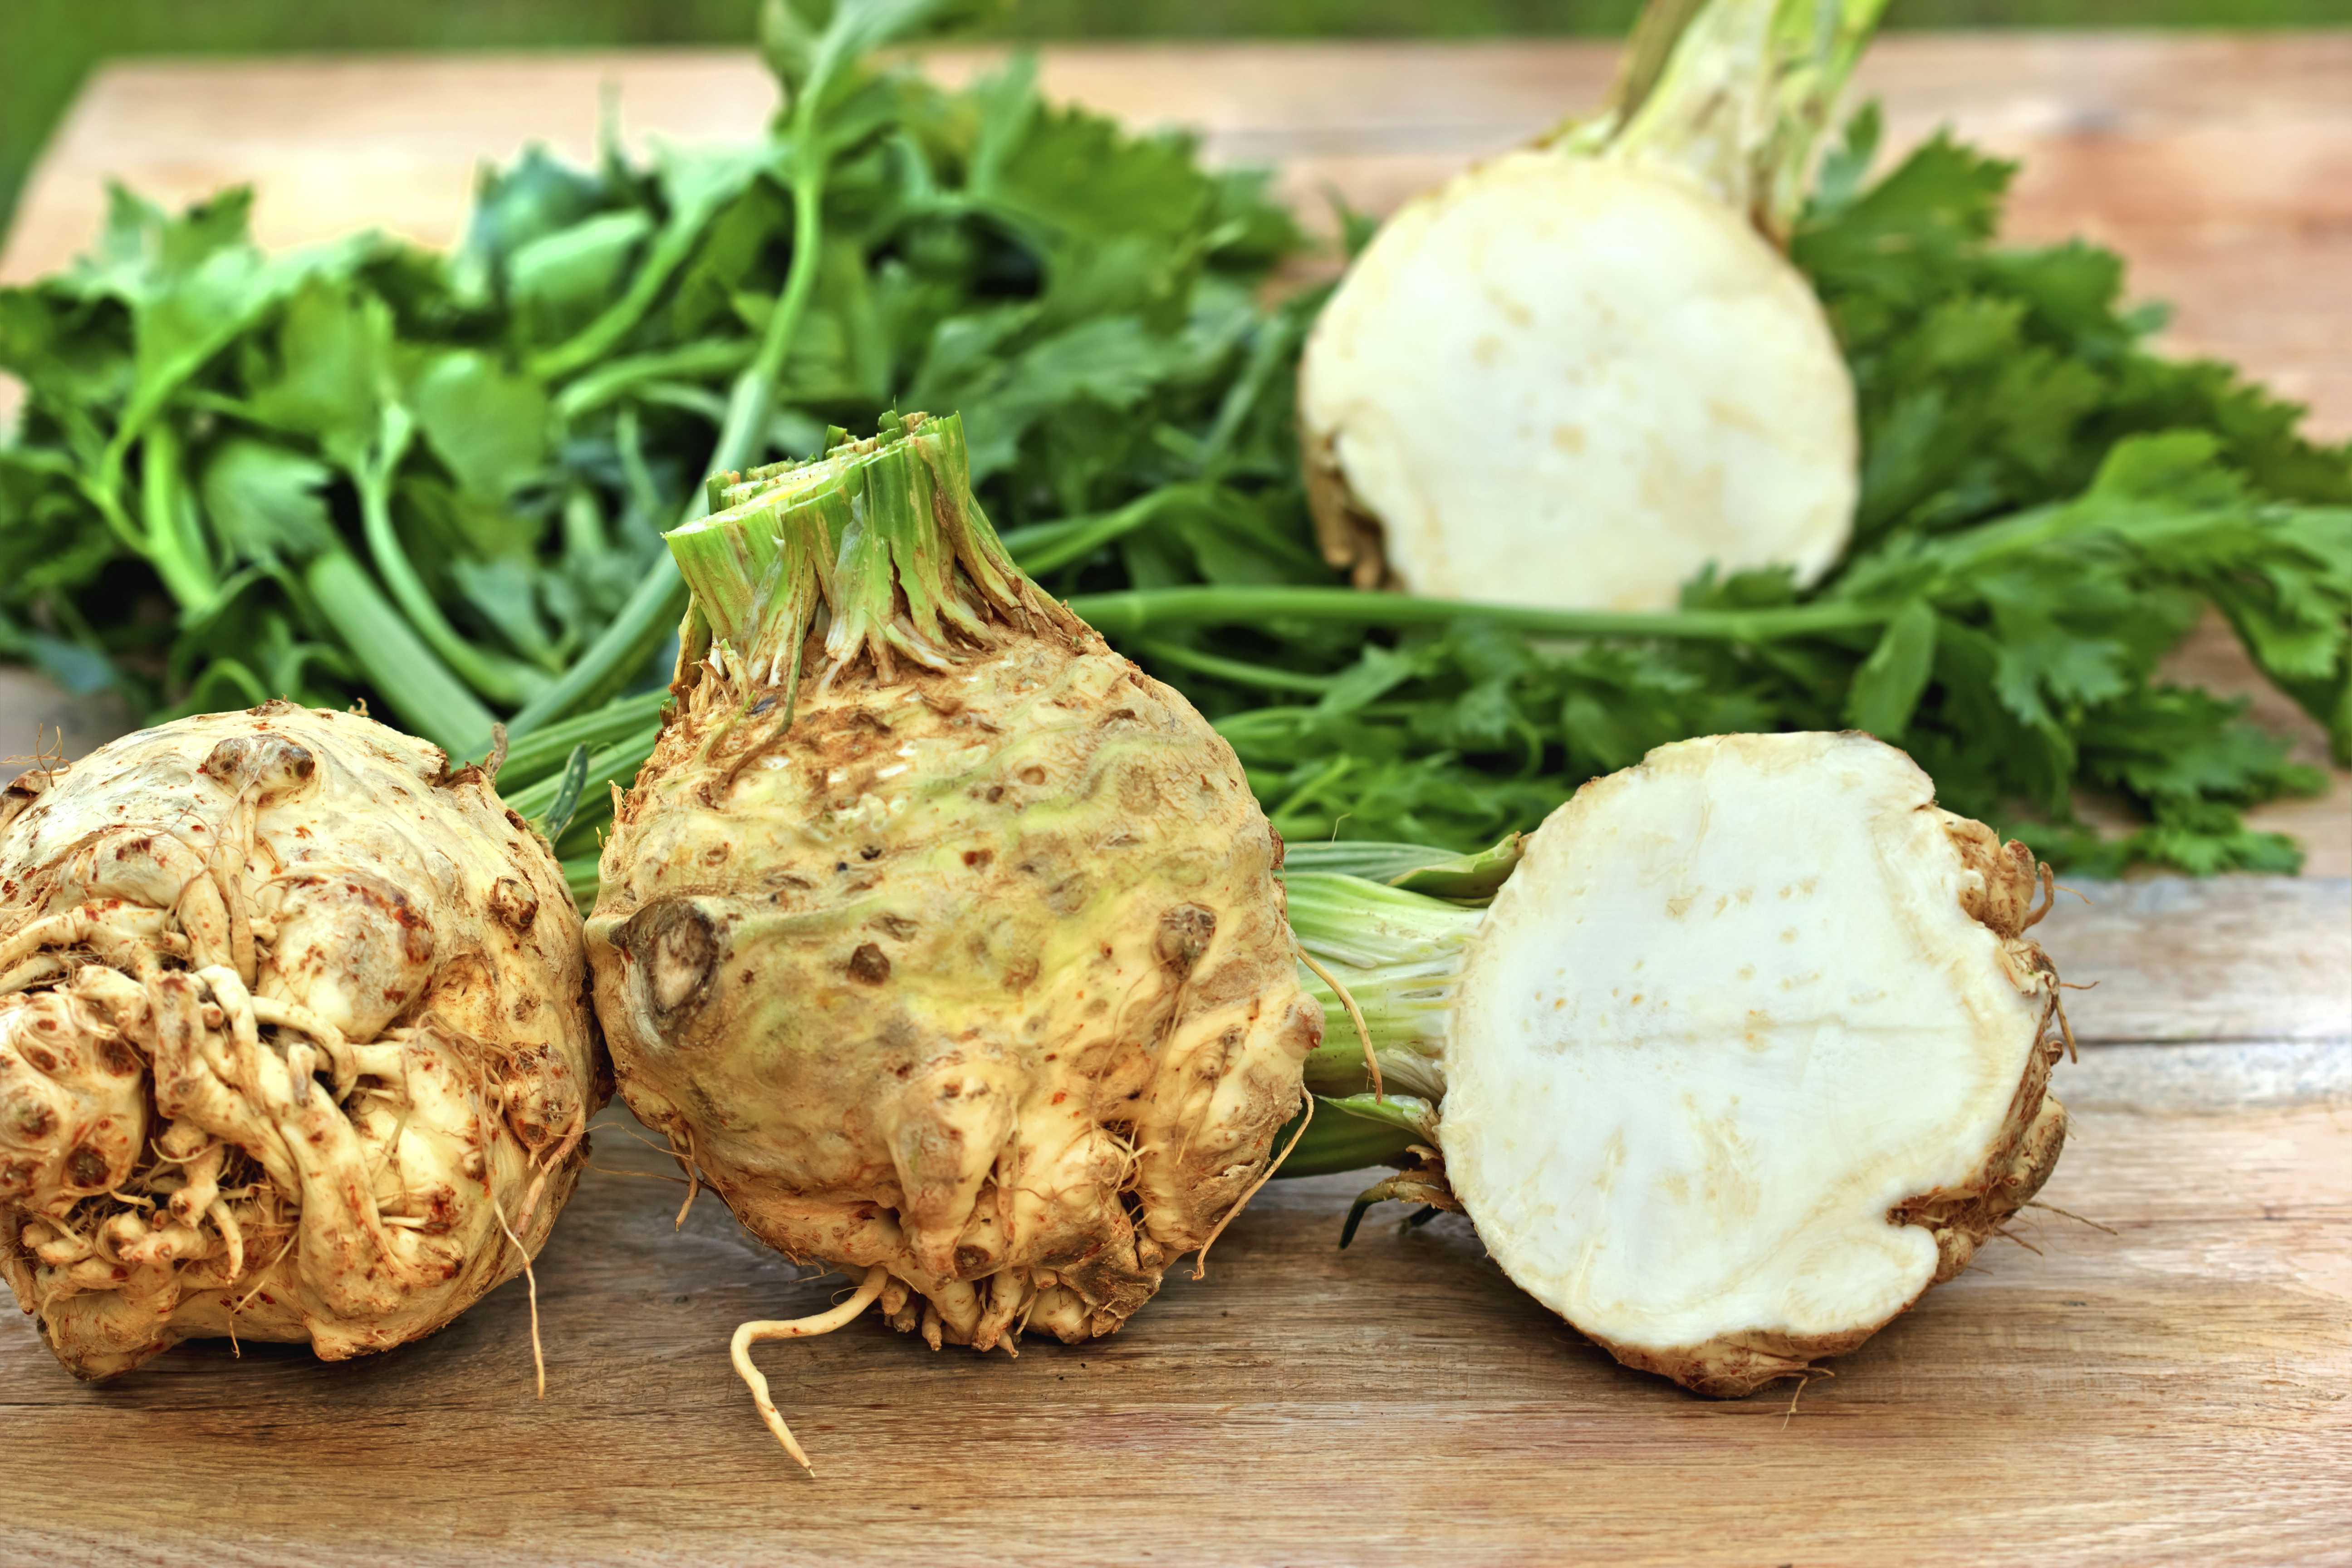 Weird White Vegetables 11